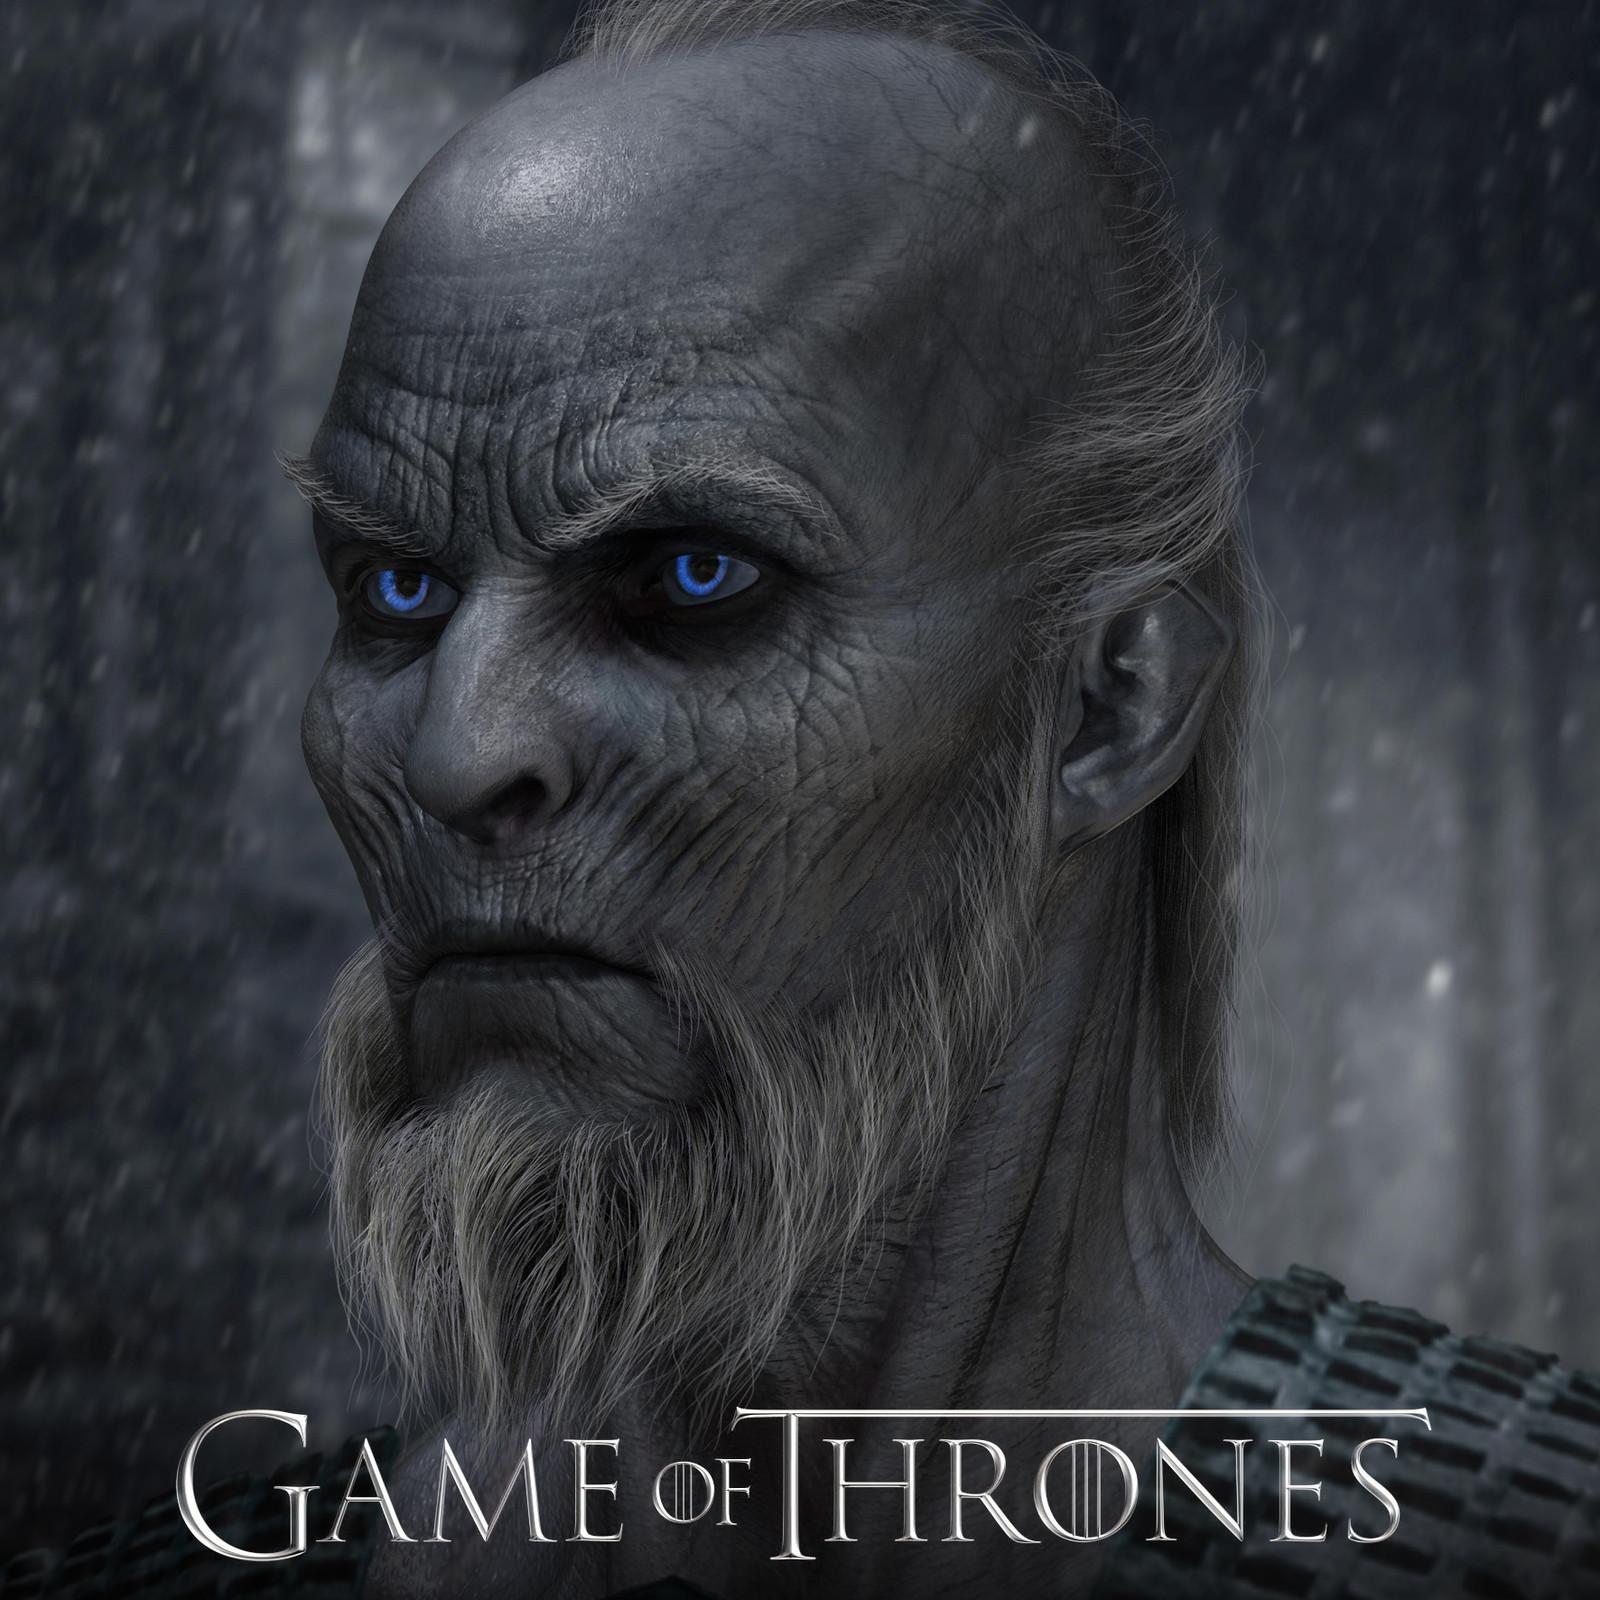 Game of Thrones - Season 7 - White Walkers